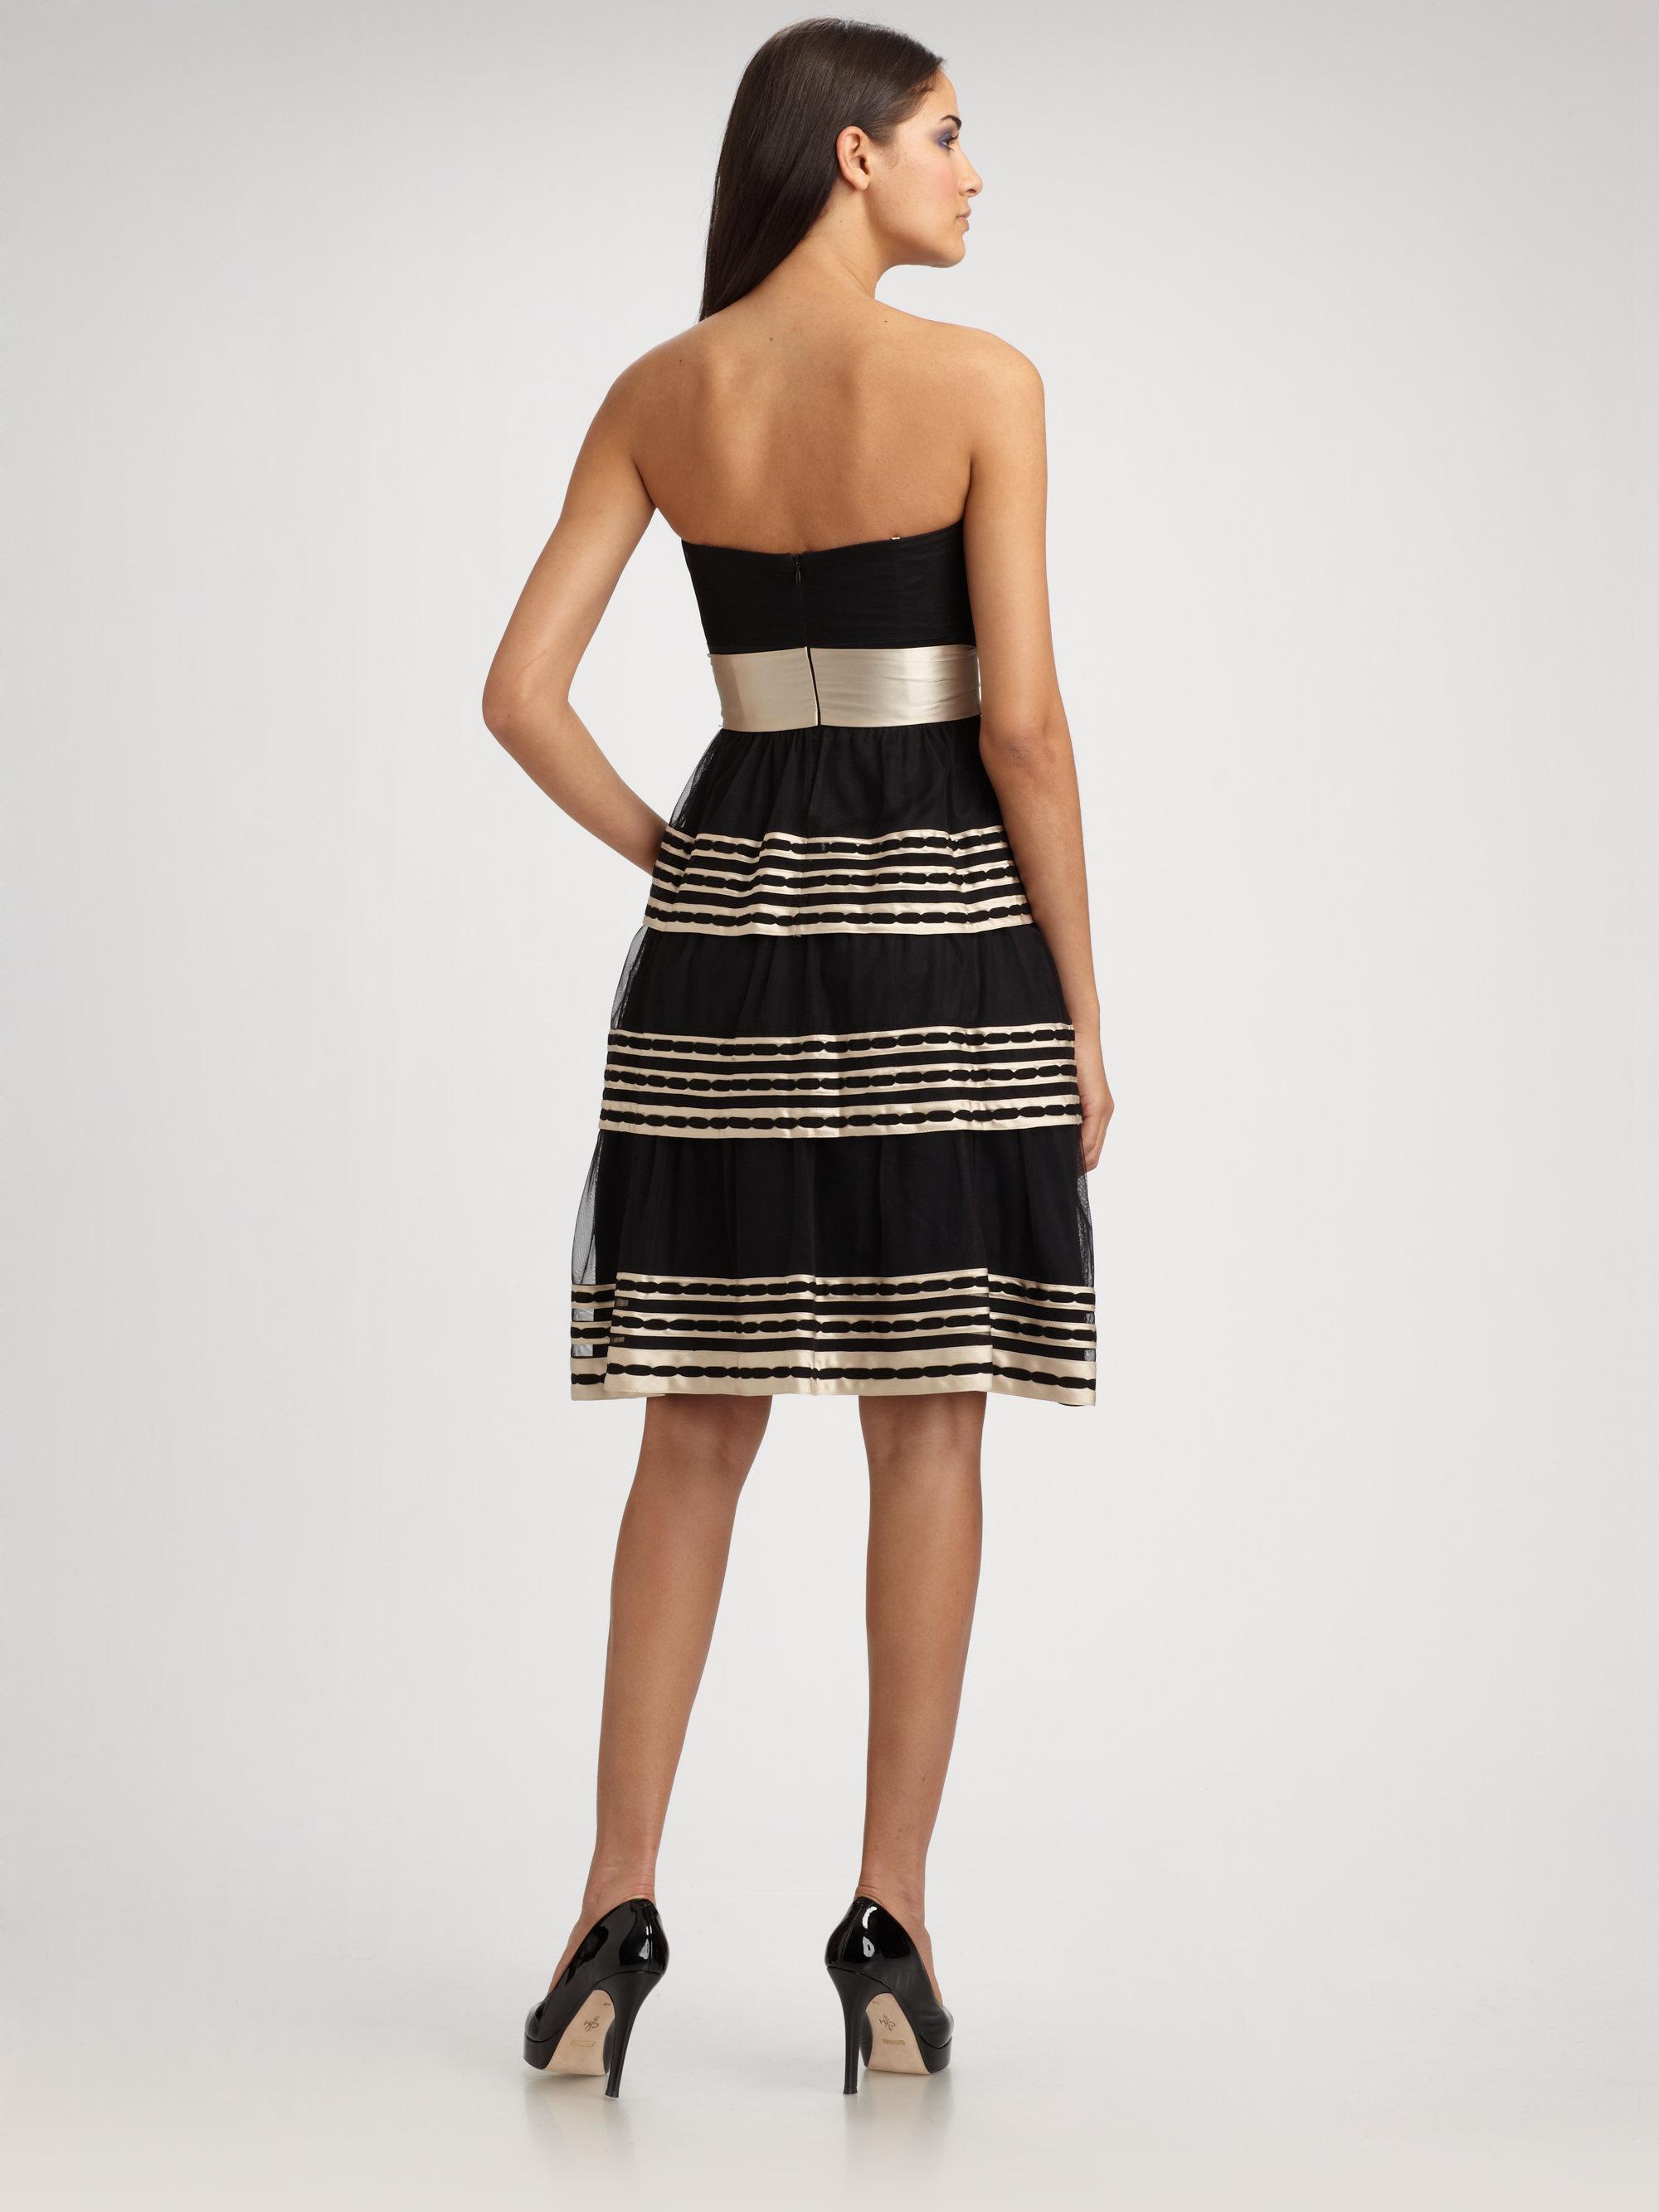 1d7800843 BCBGMAXAZRIA Tiered Tulle Strapless Dress in Black - Lyst